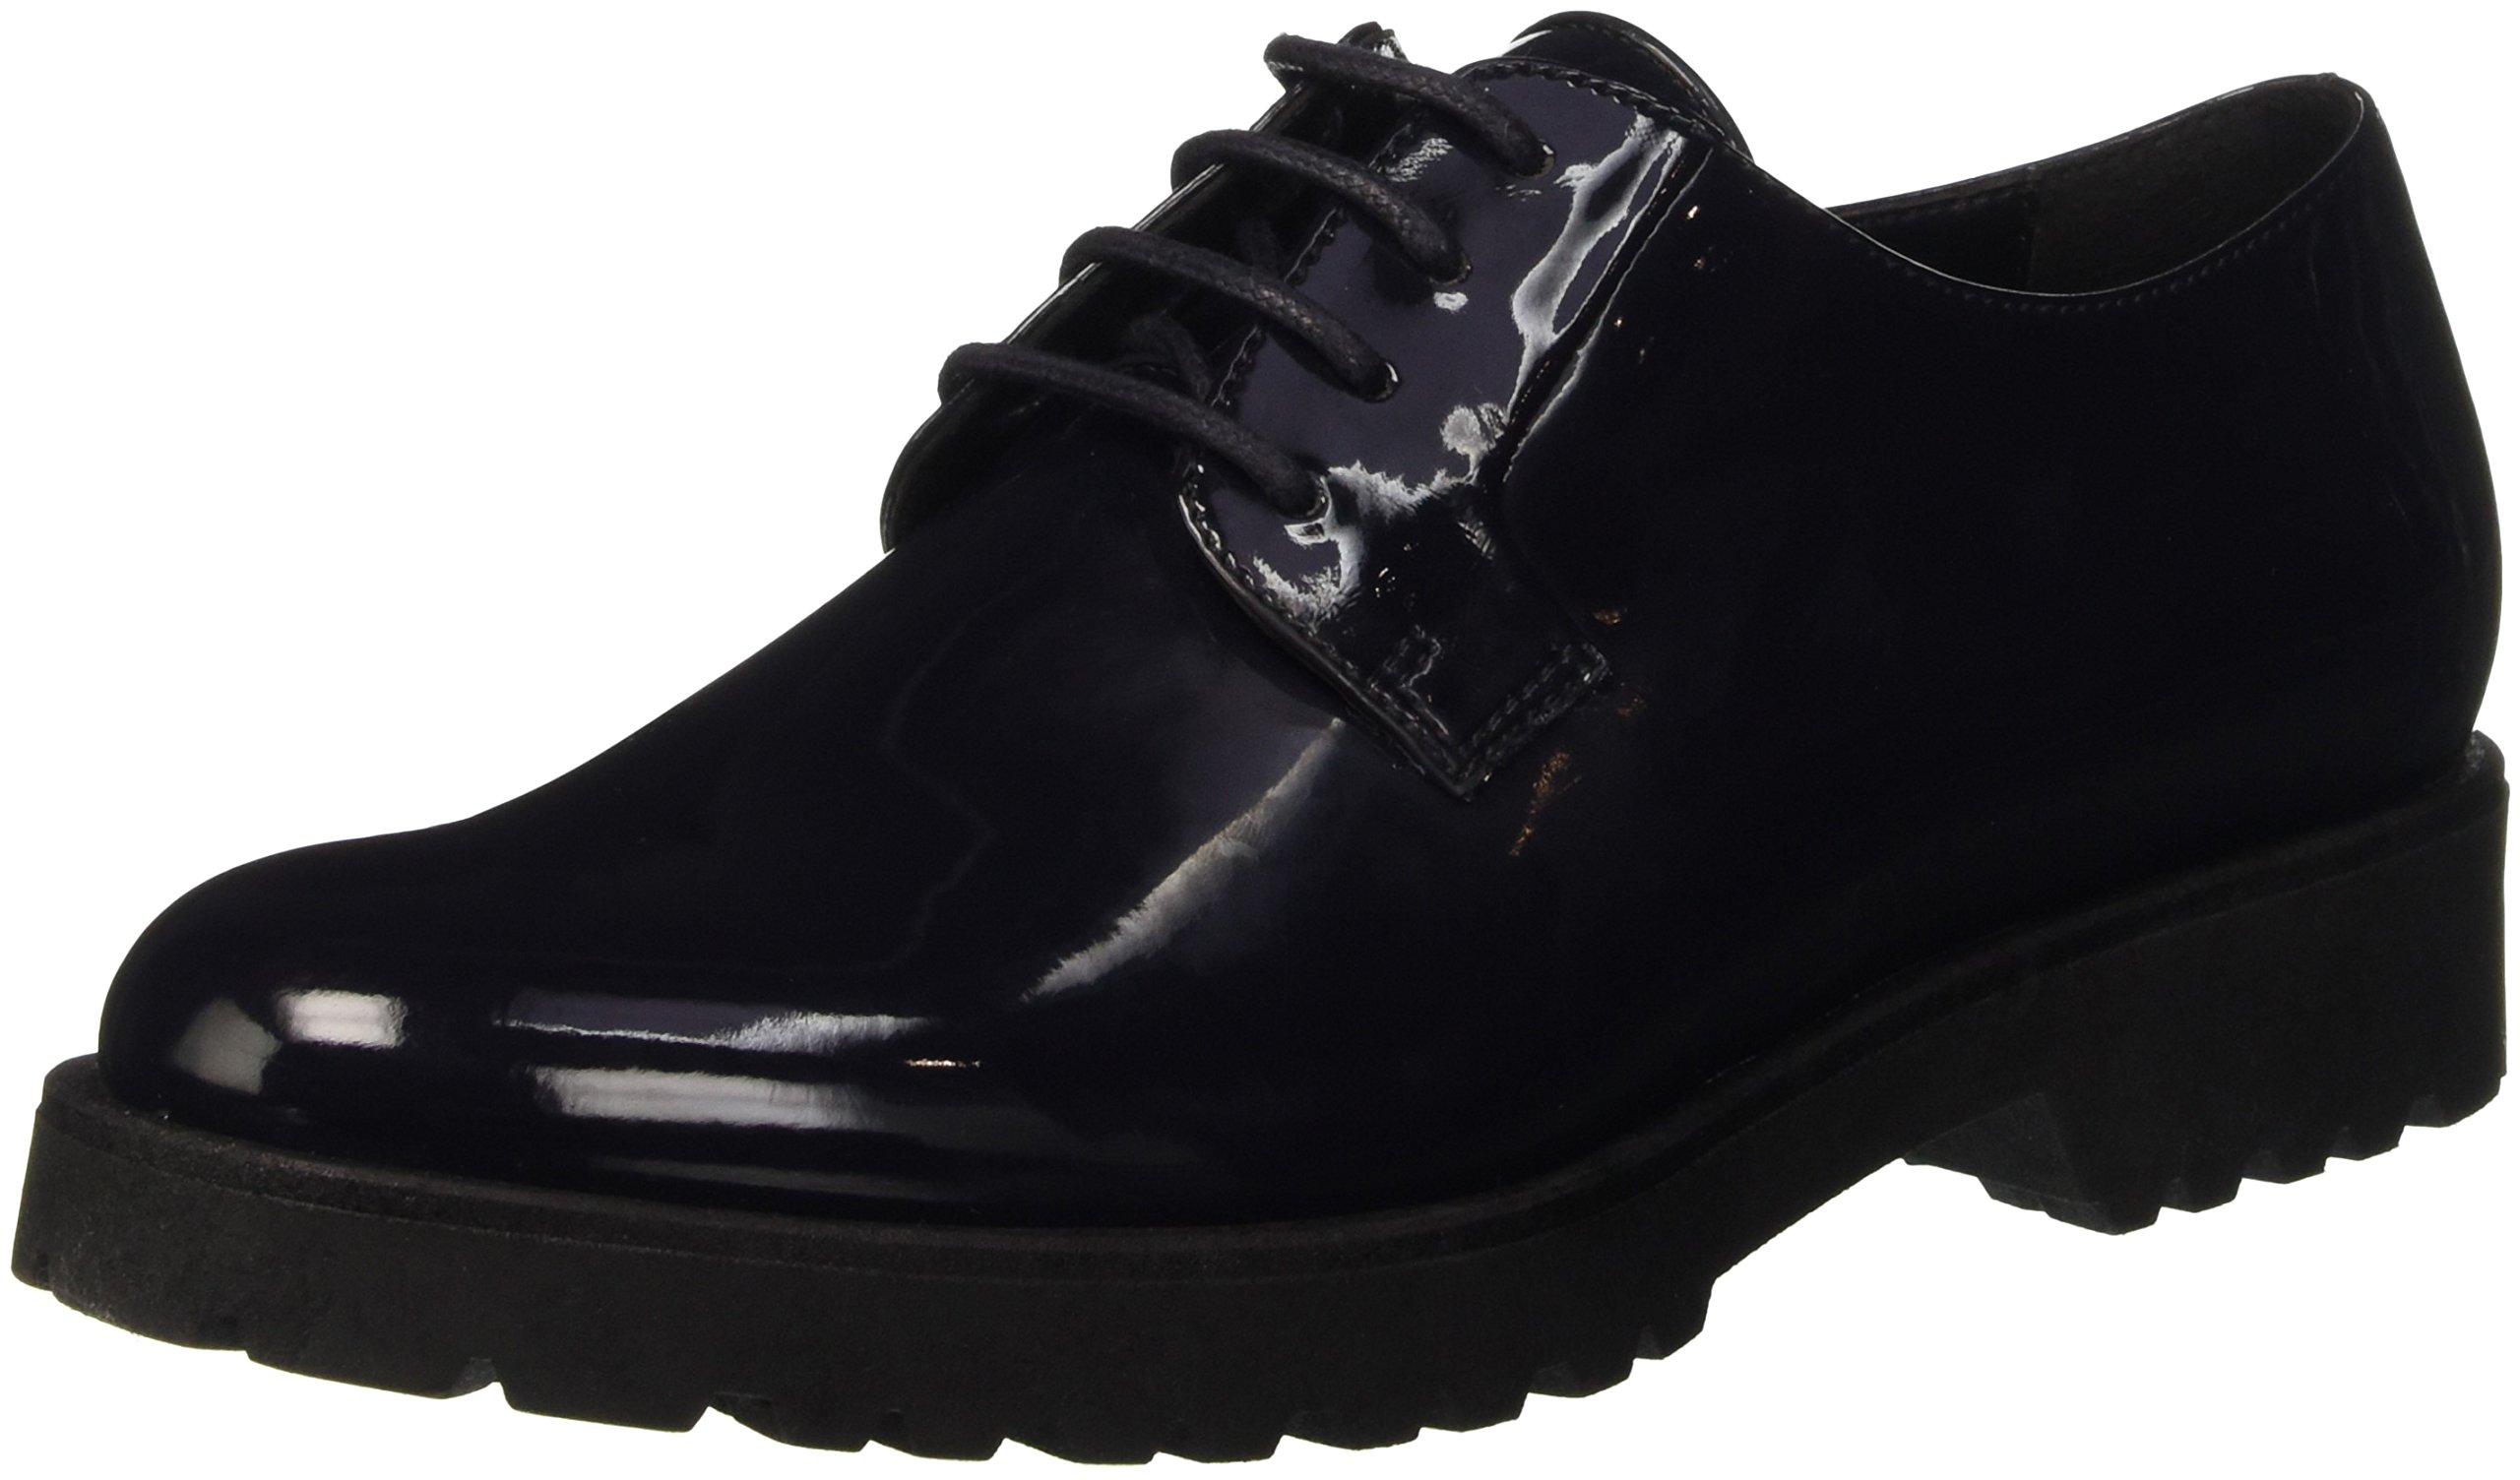 Chaussures FemmeBleu40 Sofia Eu New Docksteps À Lacets Yg6yvf7b